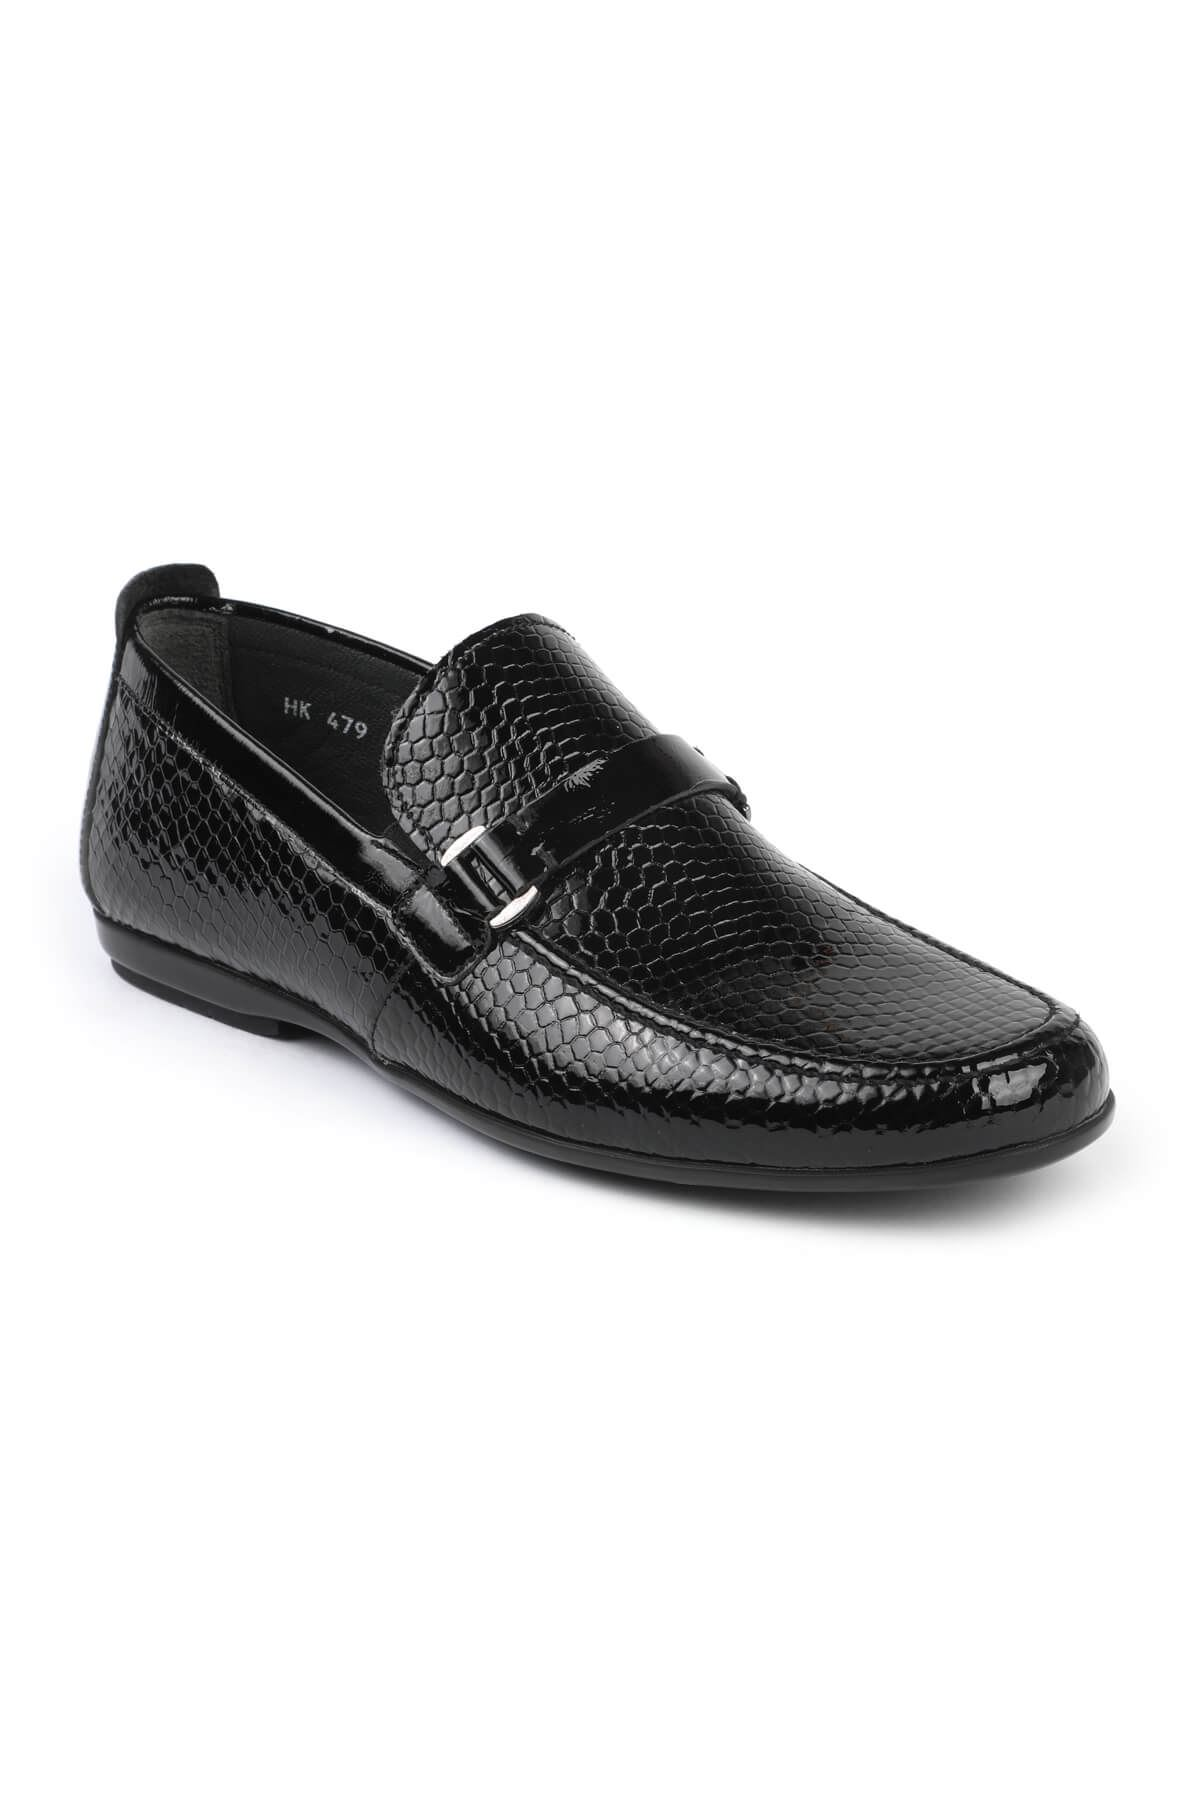 Libero C479 Black Loafer Shoes